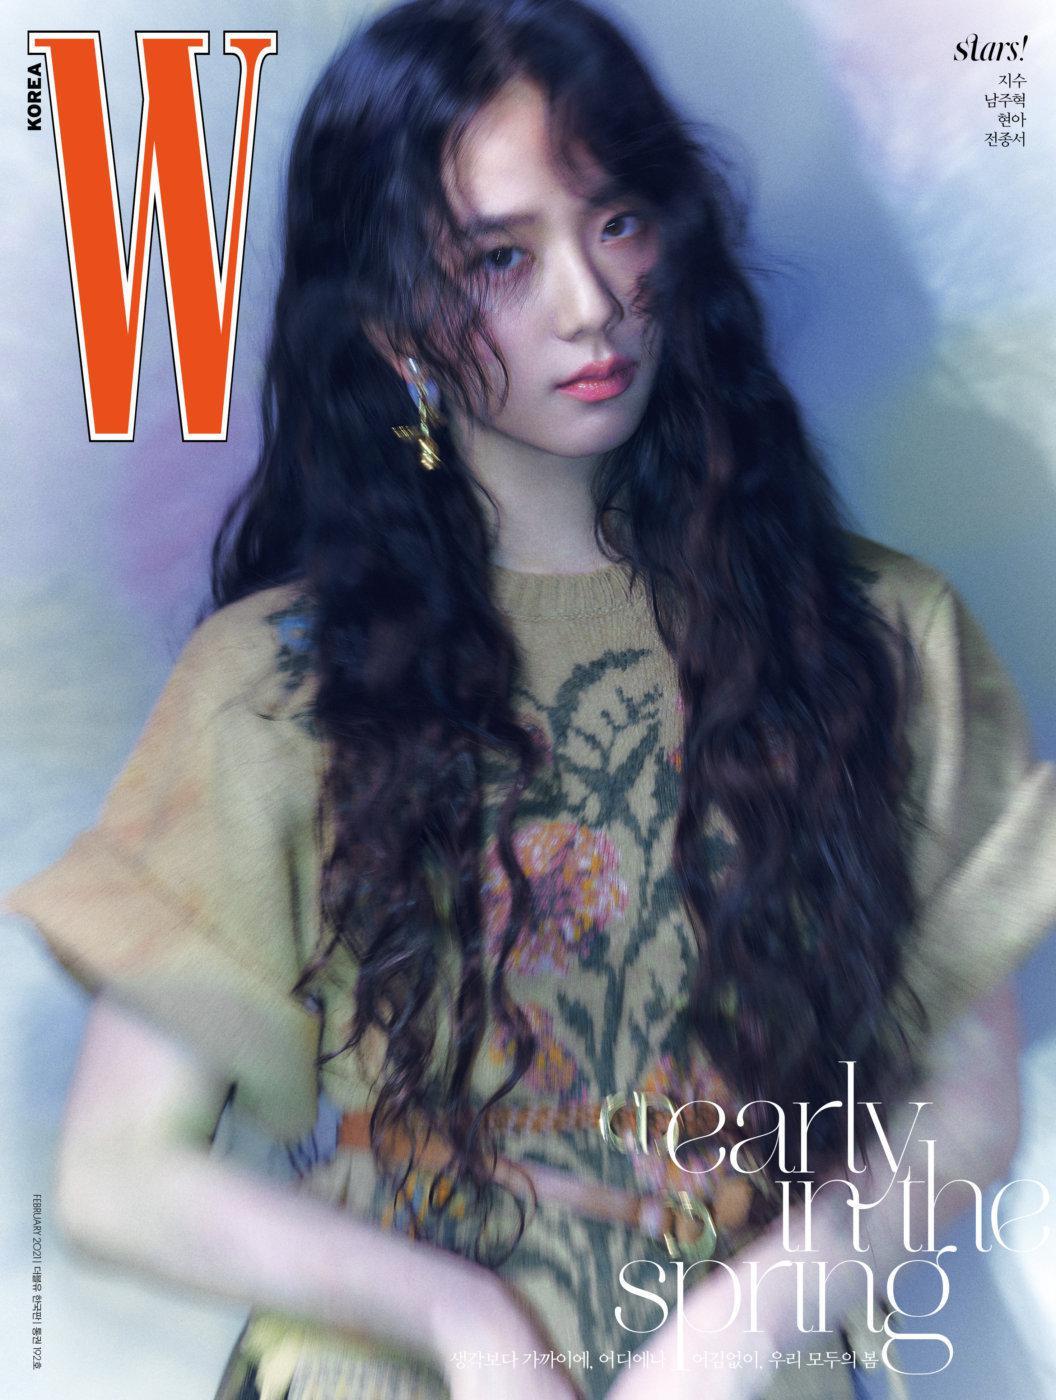 金智秀(jisoo)× Dior ×Wkorea 2月号封面……